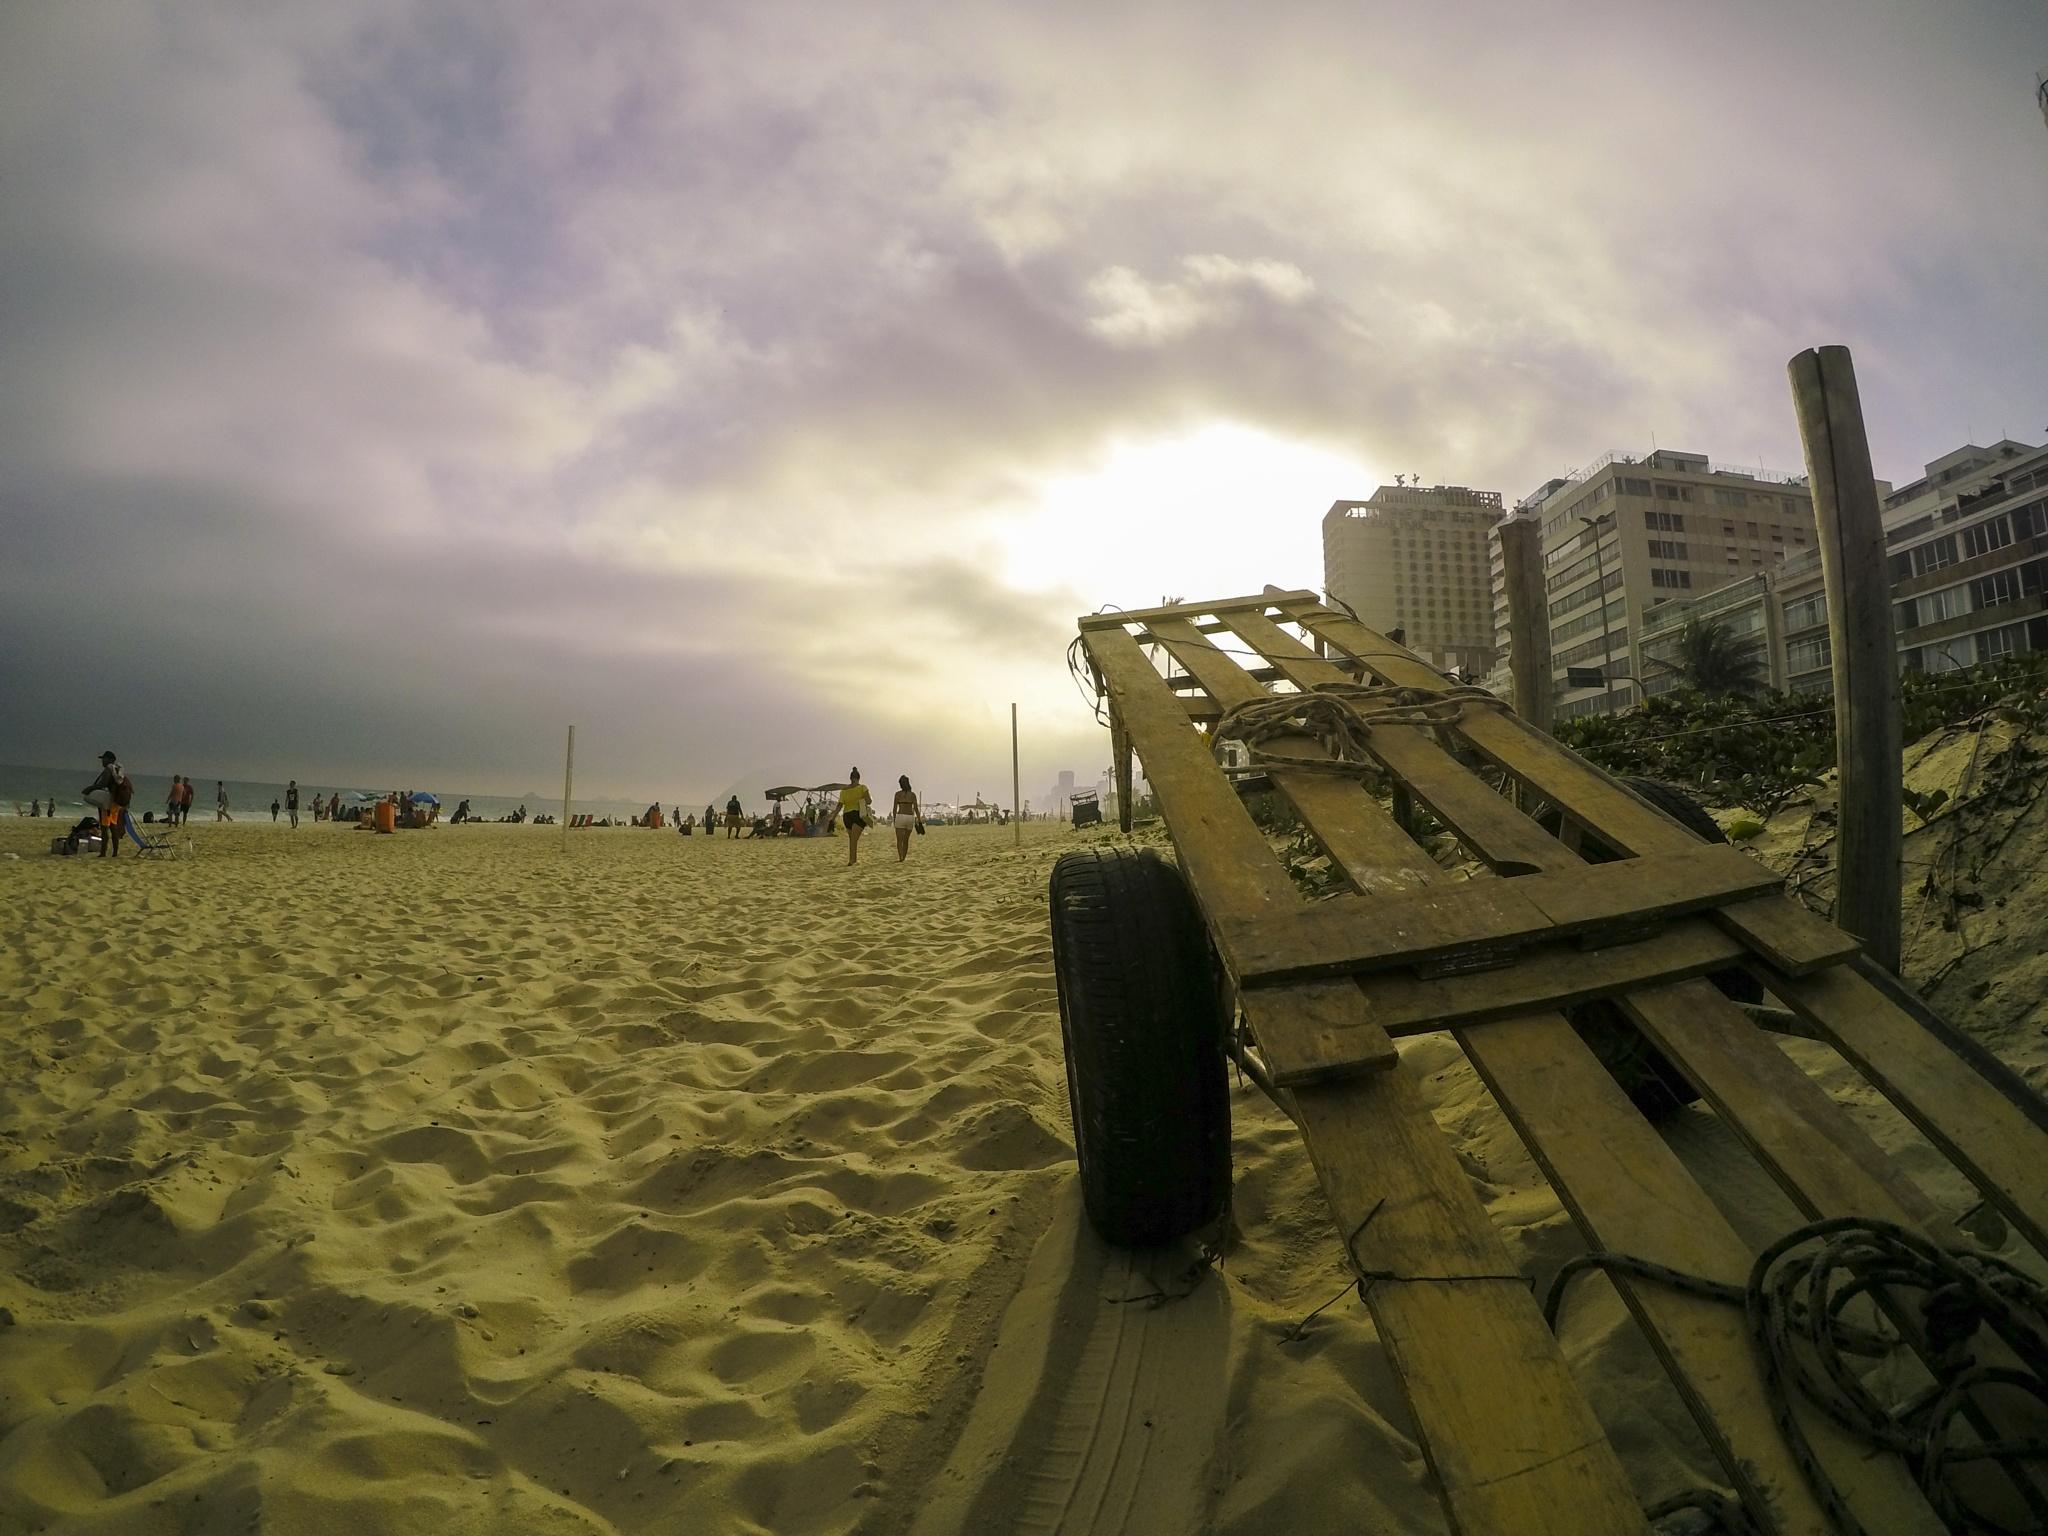 Ipanema beach by Marcelo Zal Riani